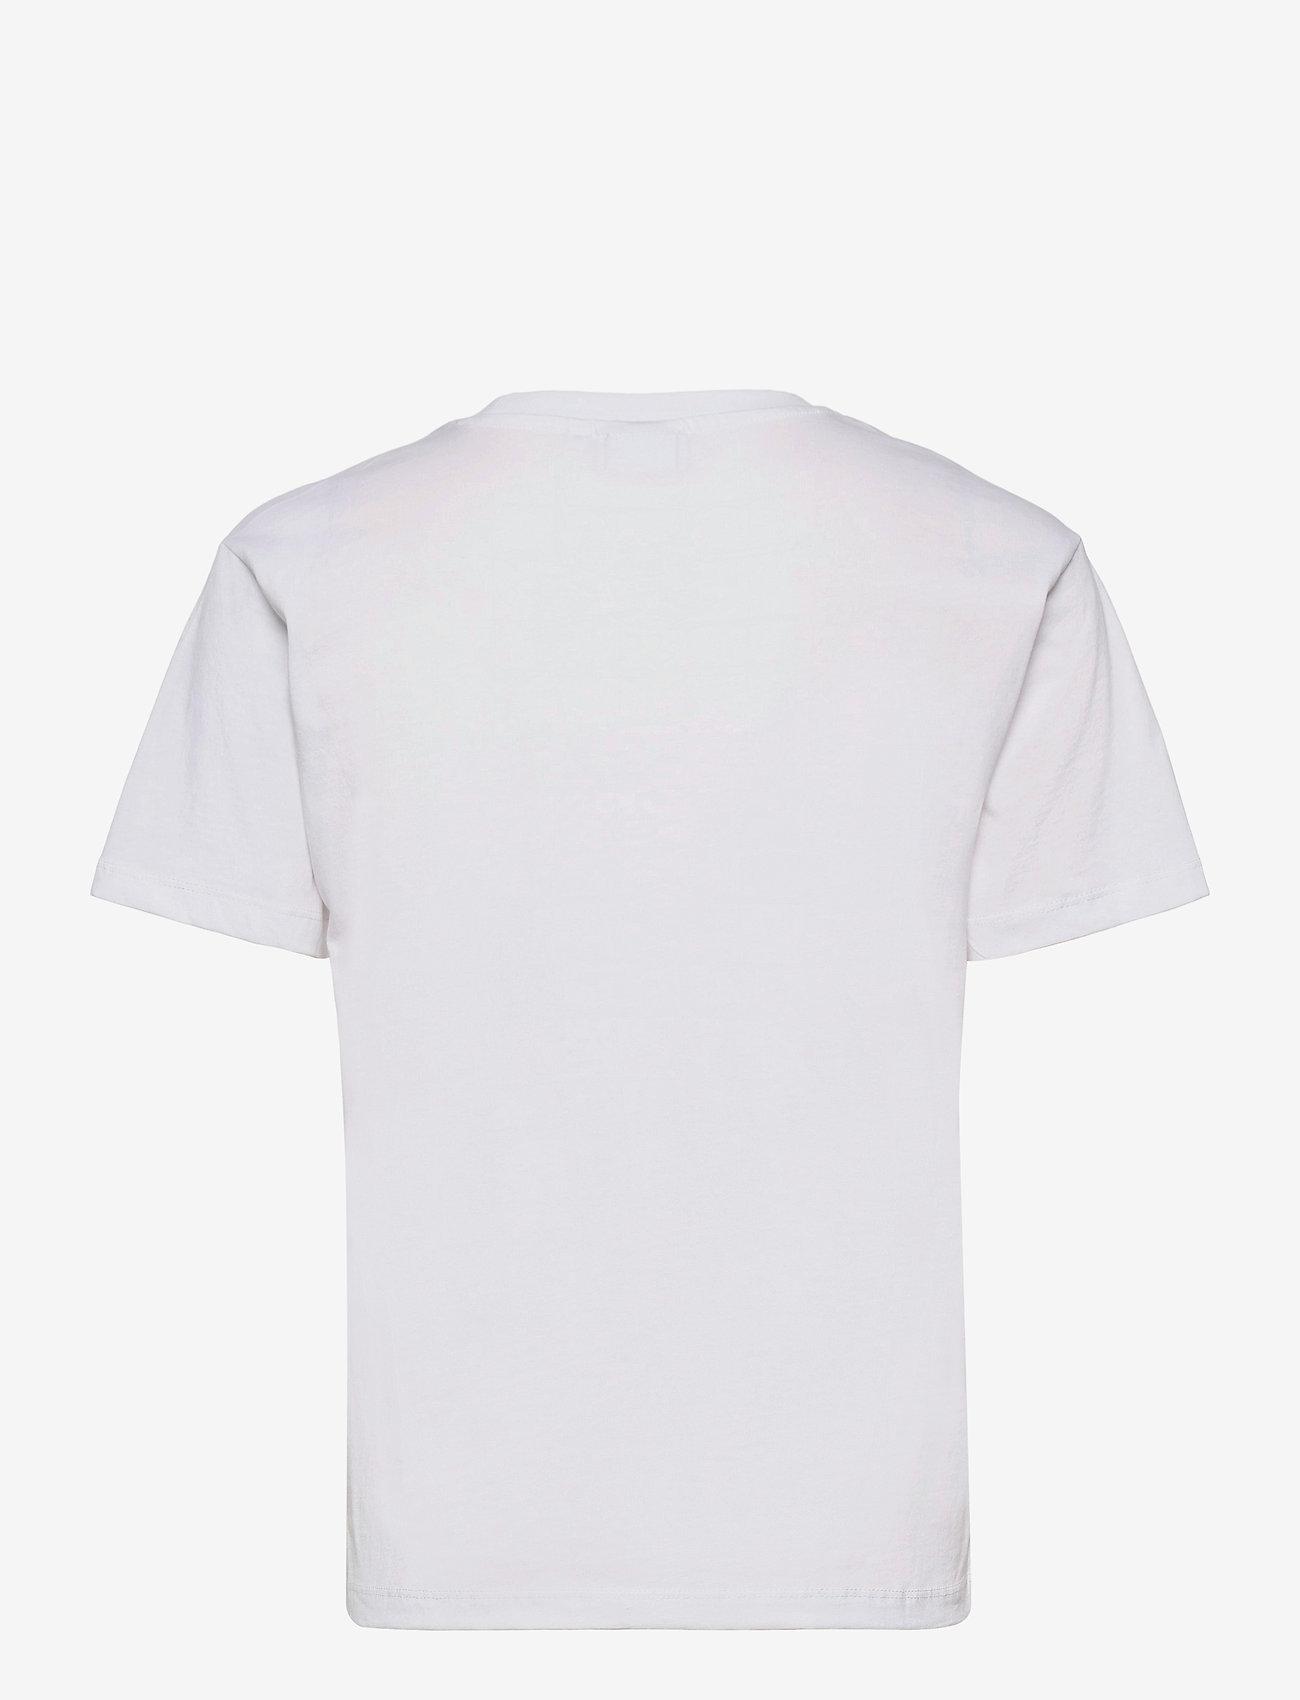 FILA - WOMEN EARA tee - t-shirts - bright white - 1